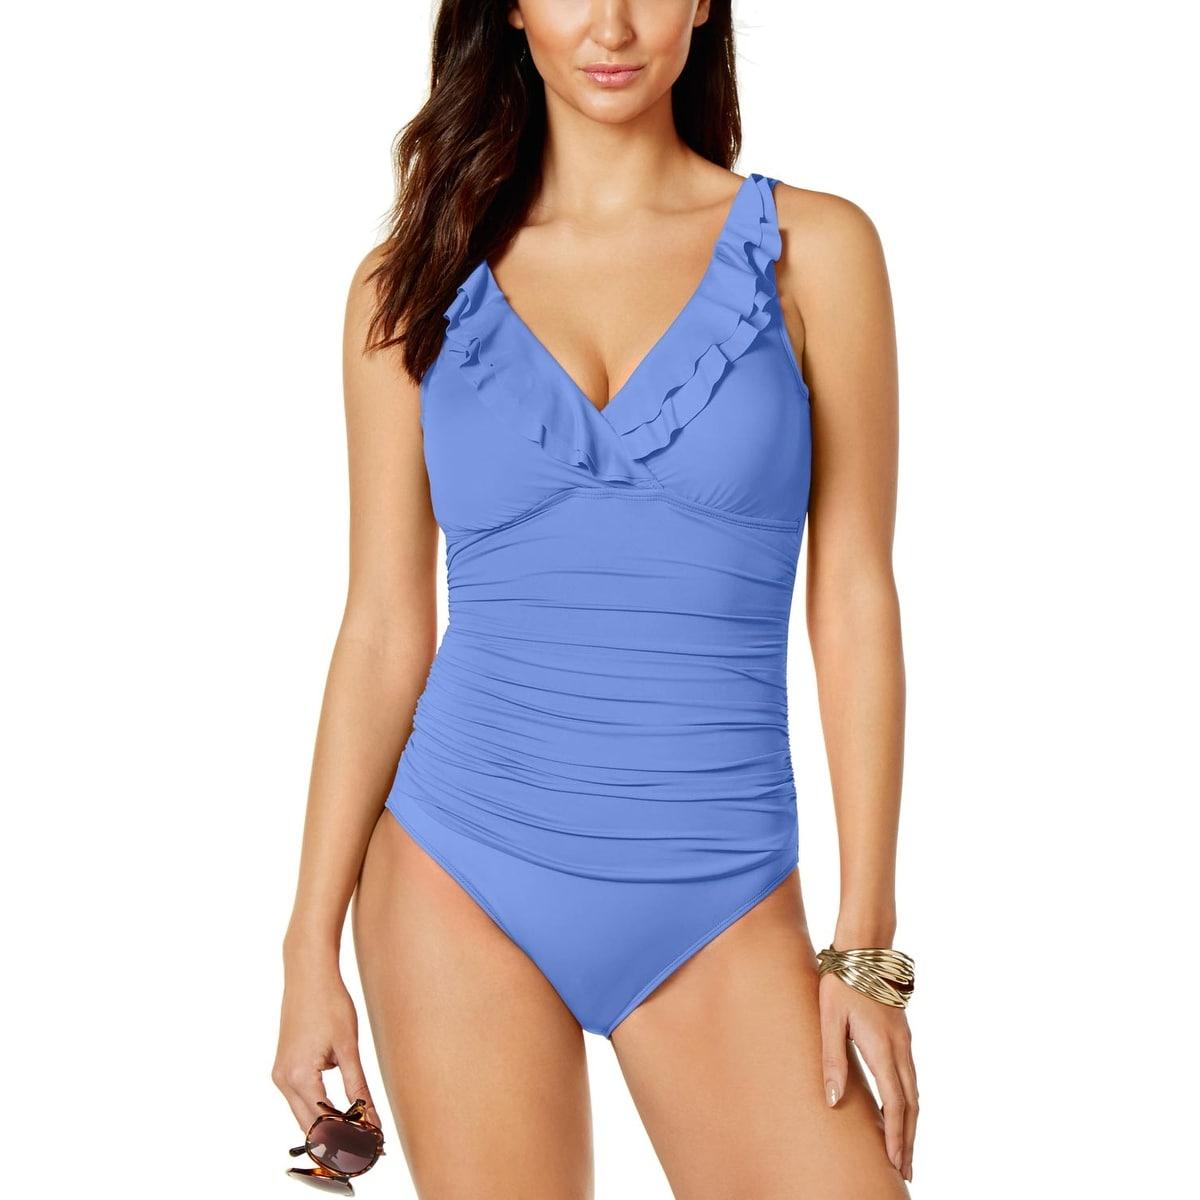 07cb994943 Ralph Lauren Swimwear | Find Great Women's Clothing Deals Shopping at  Overstock